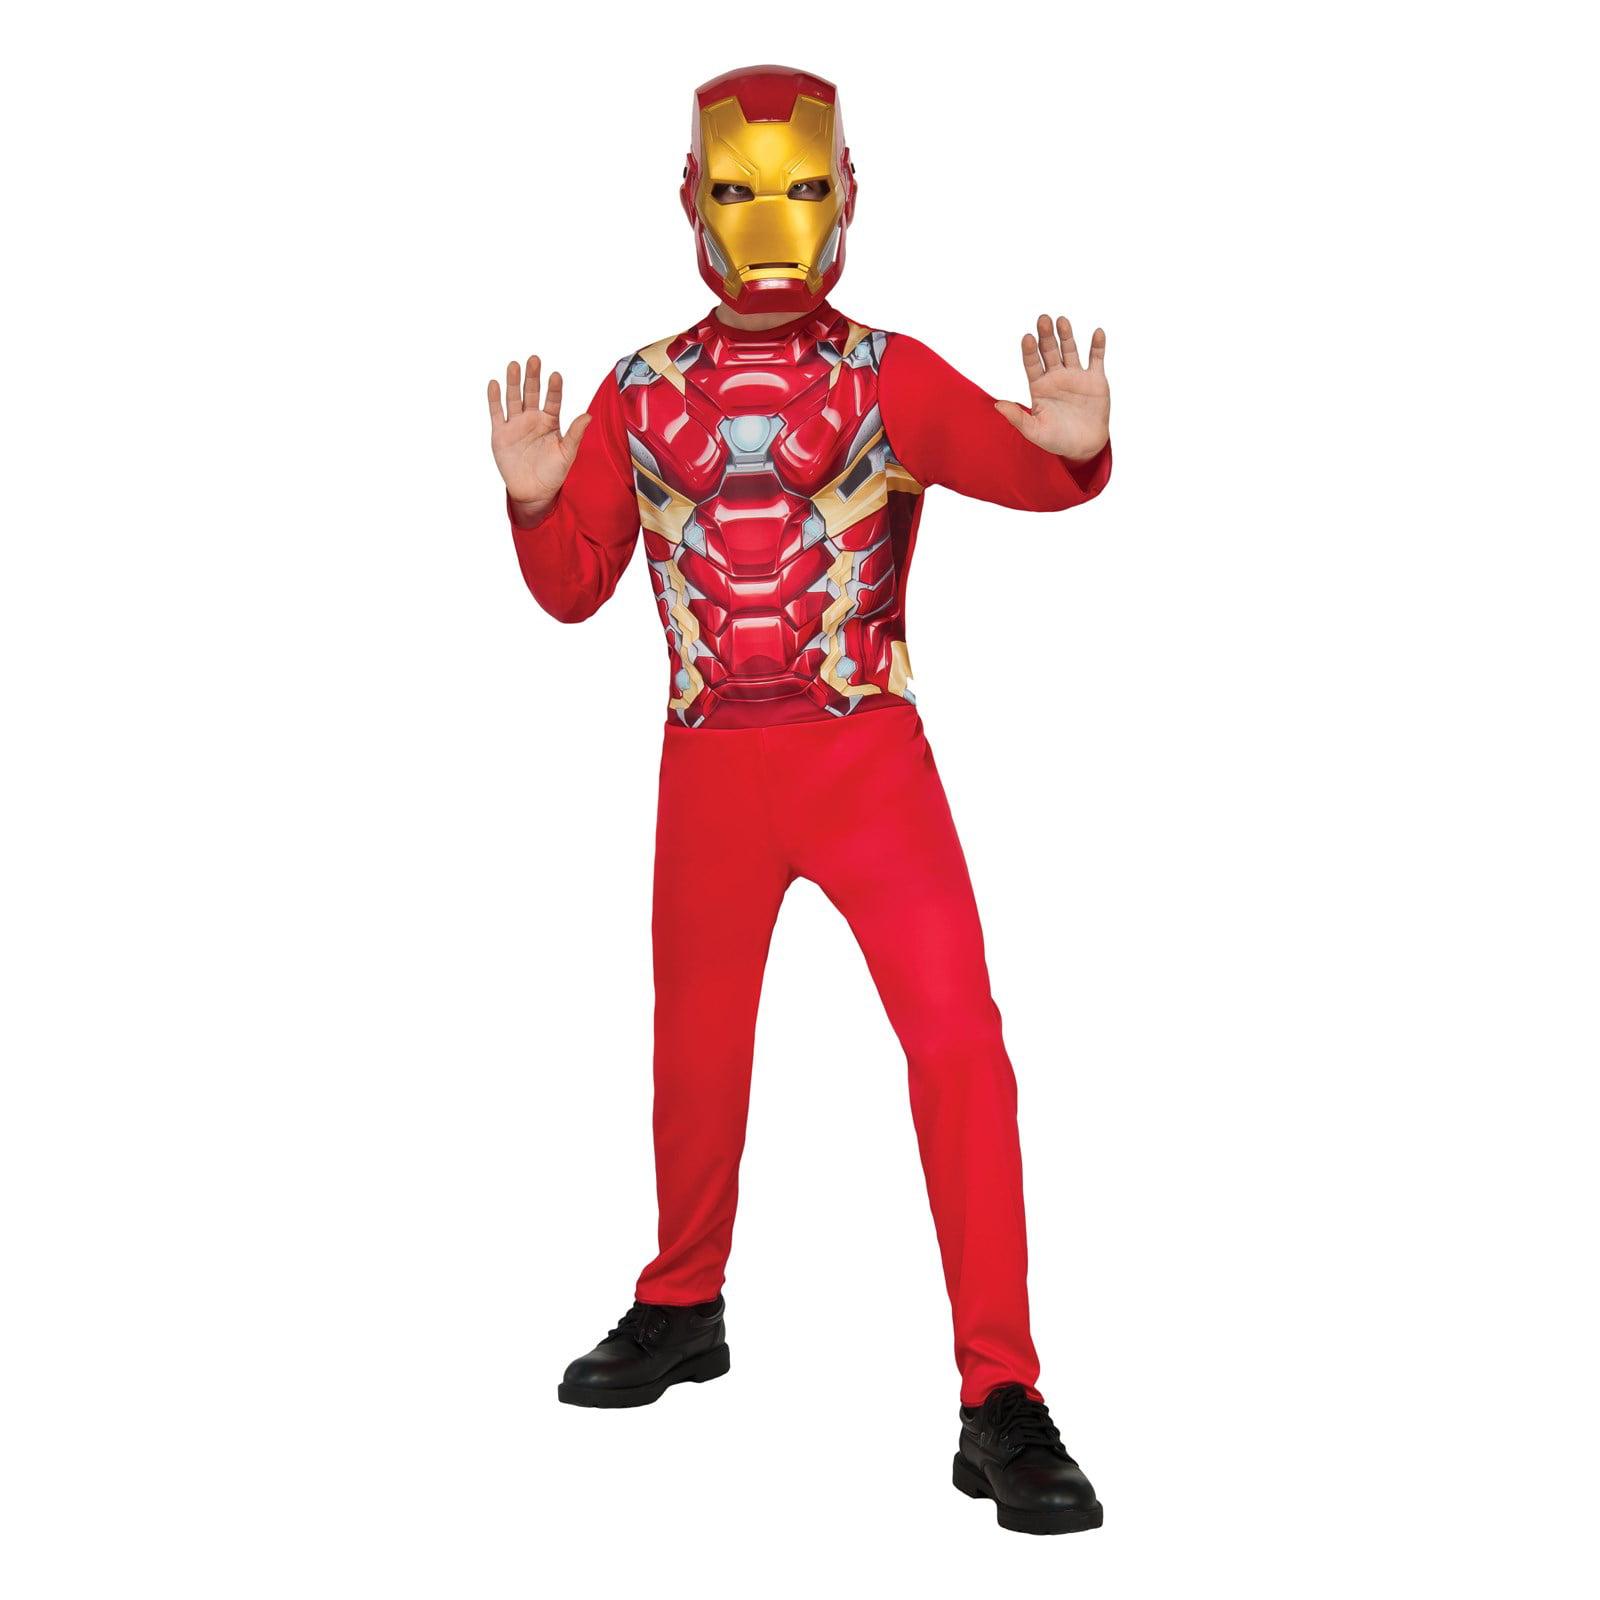 Captain America: Civil War Iron Man Costume for Kids